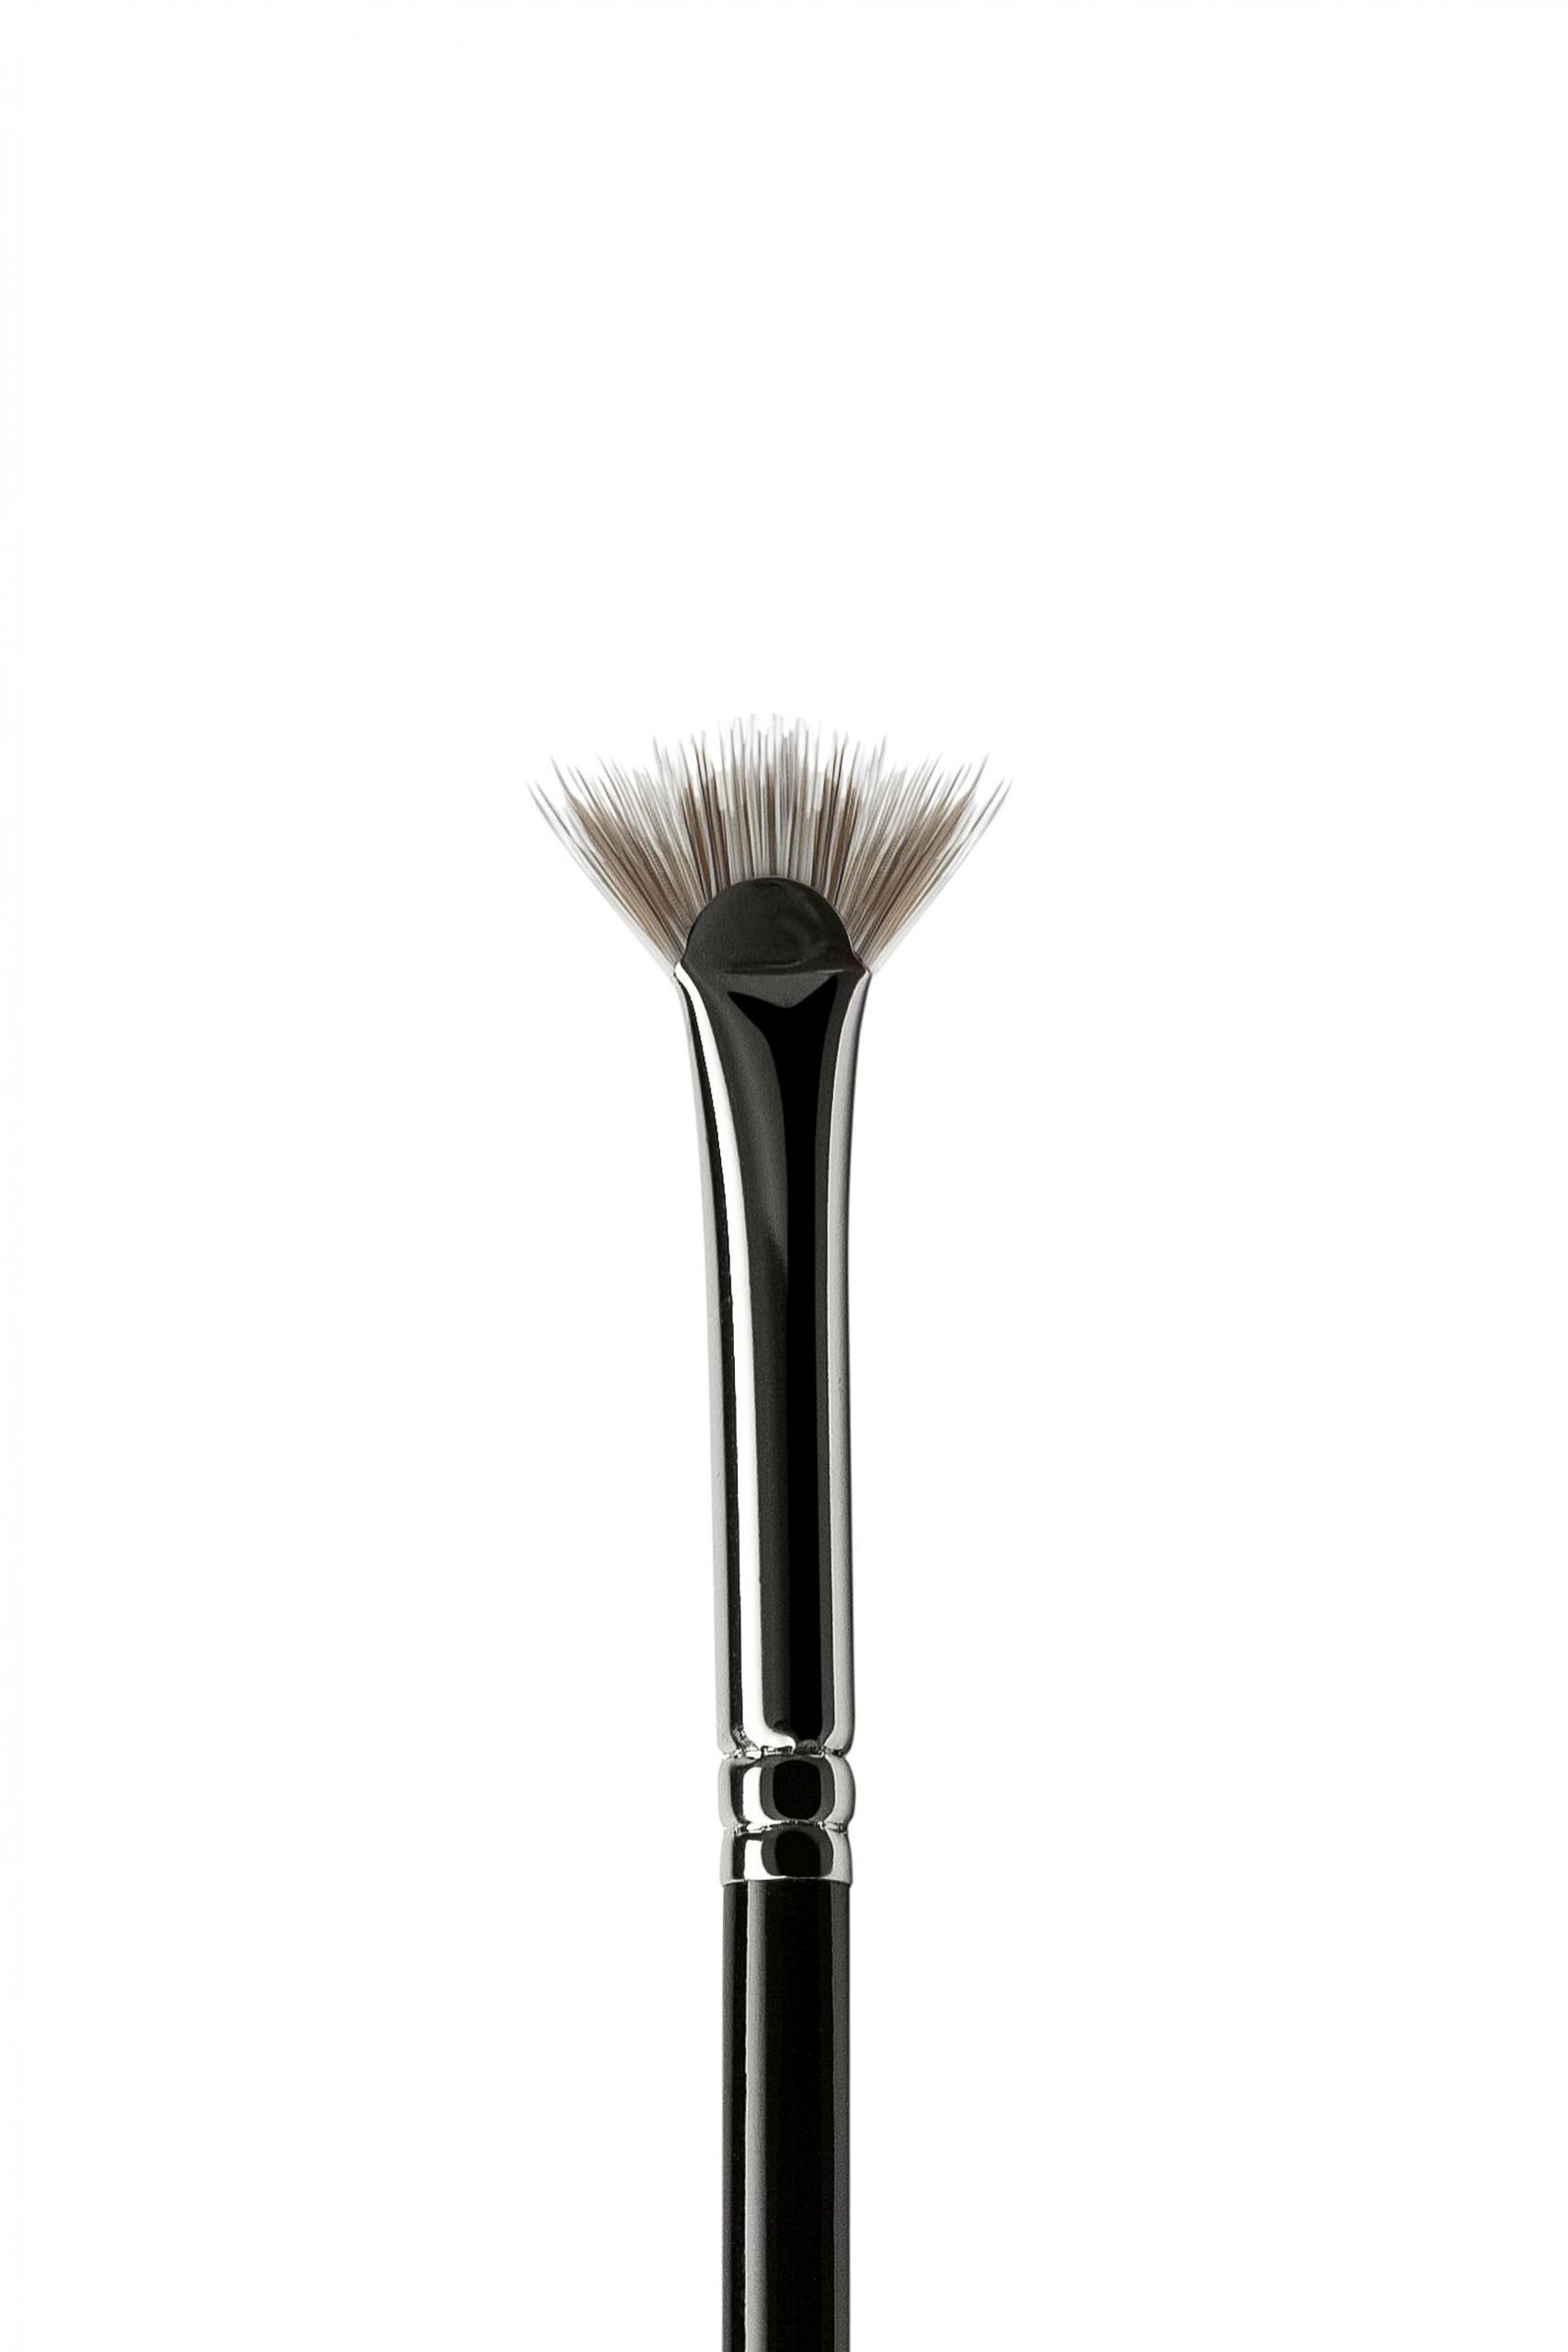 Bristles Eyelash brush Annbeauty A20